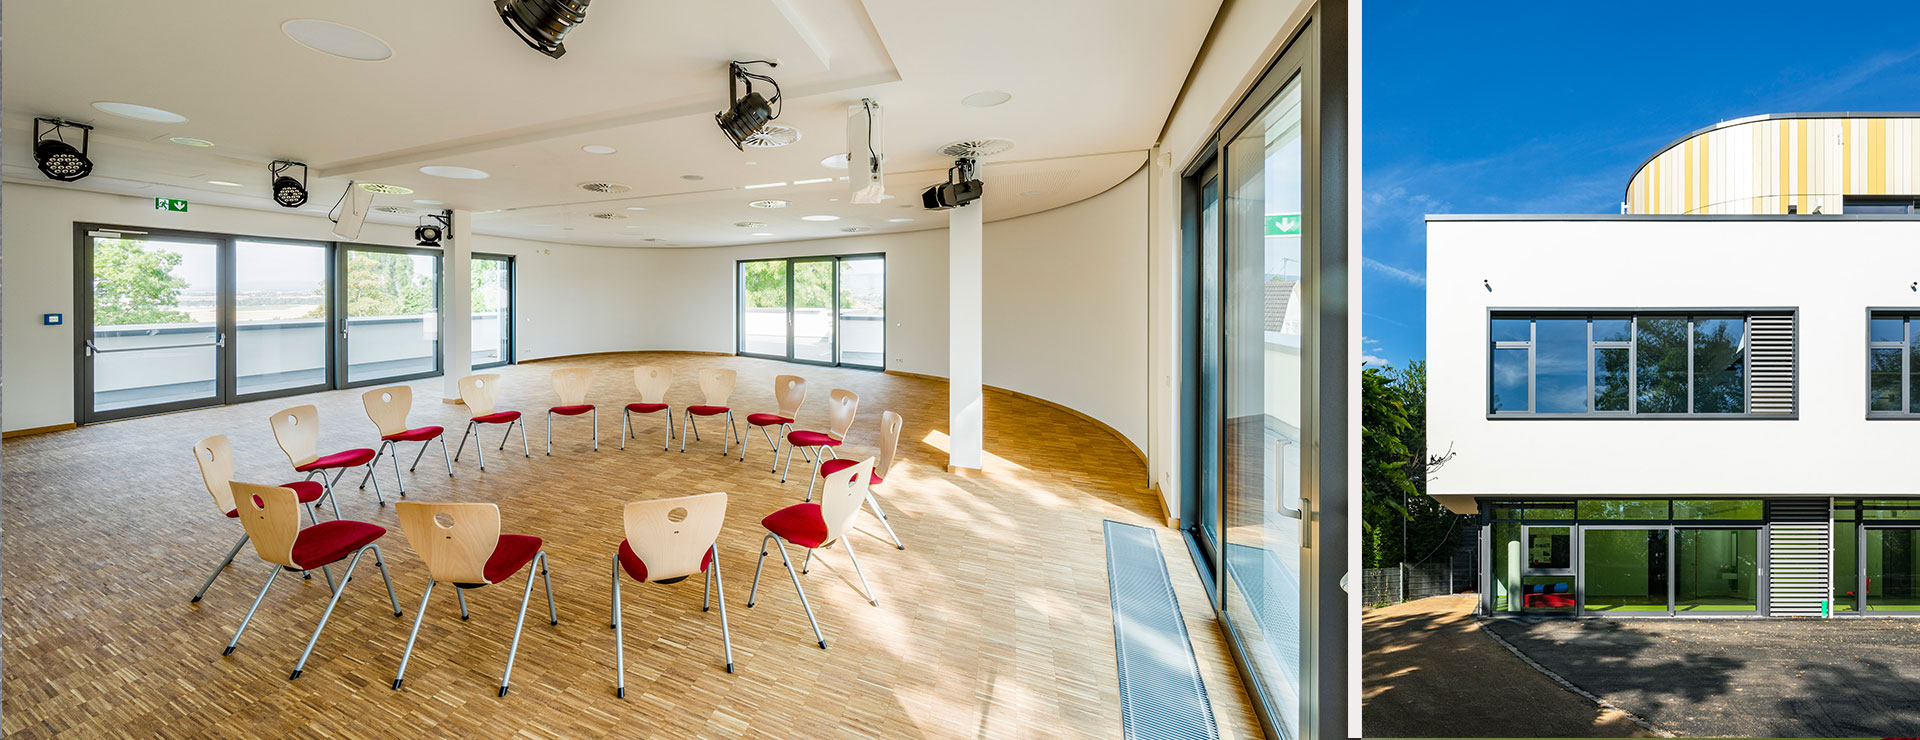 BGF+ Architekten: Einwiehungsfeier Peter-Rosegger-Schule in Wiesbaden